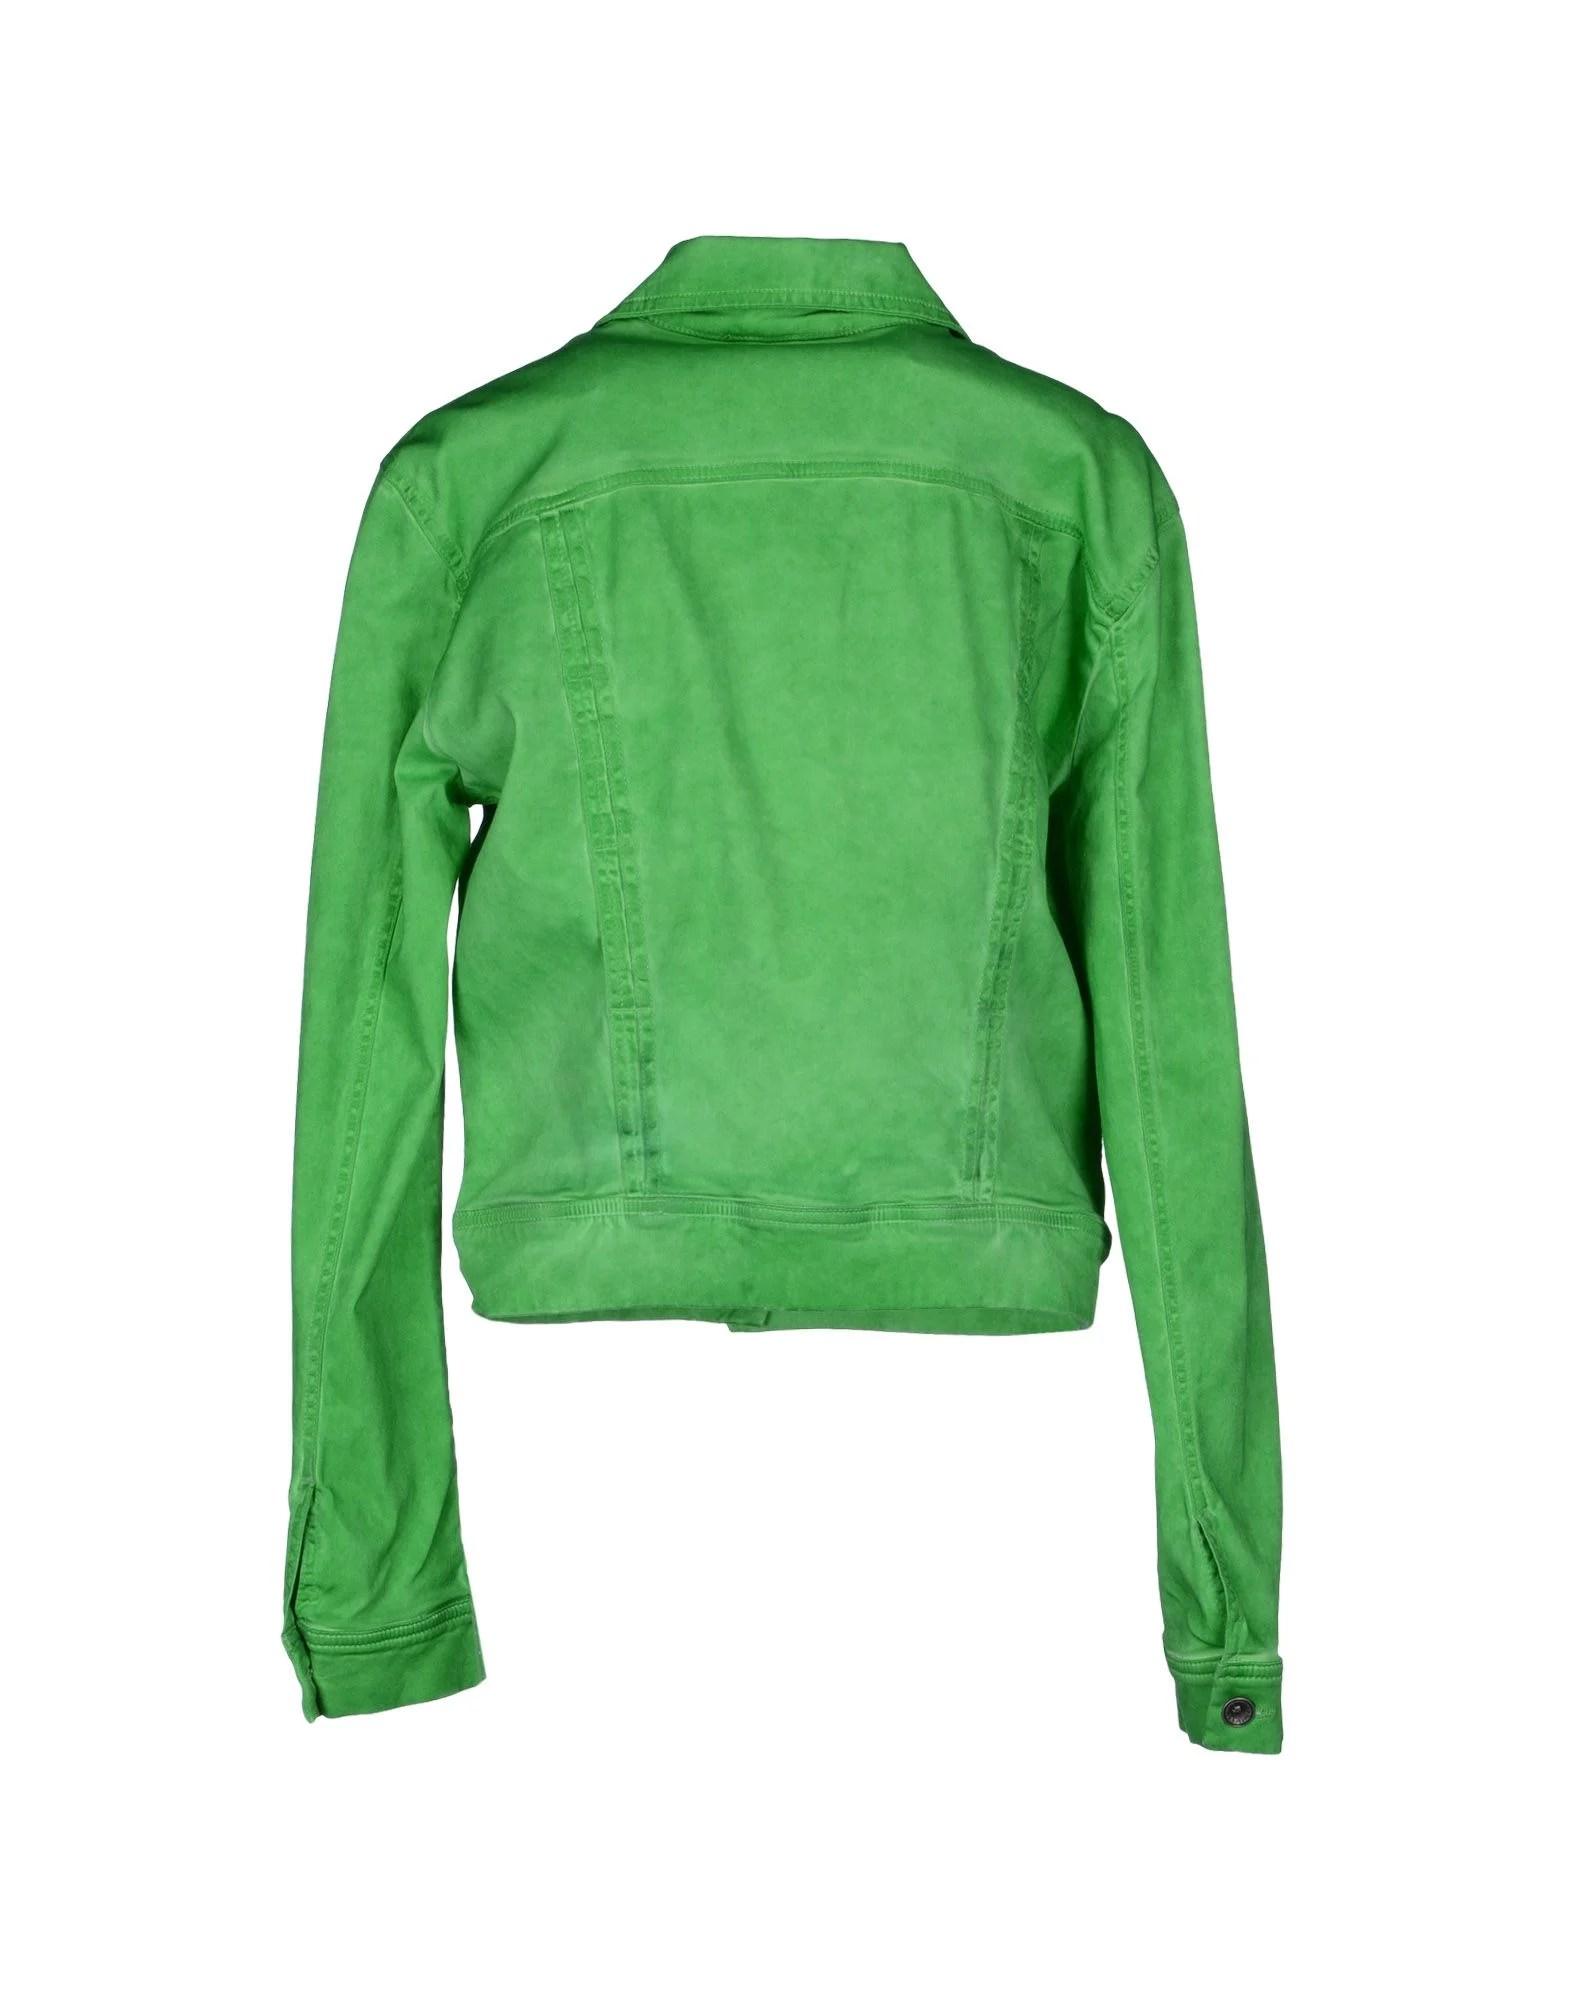 Plein Sud Jeanius Jacket In Green Lyst